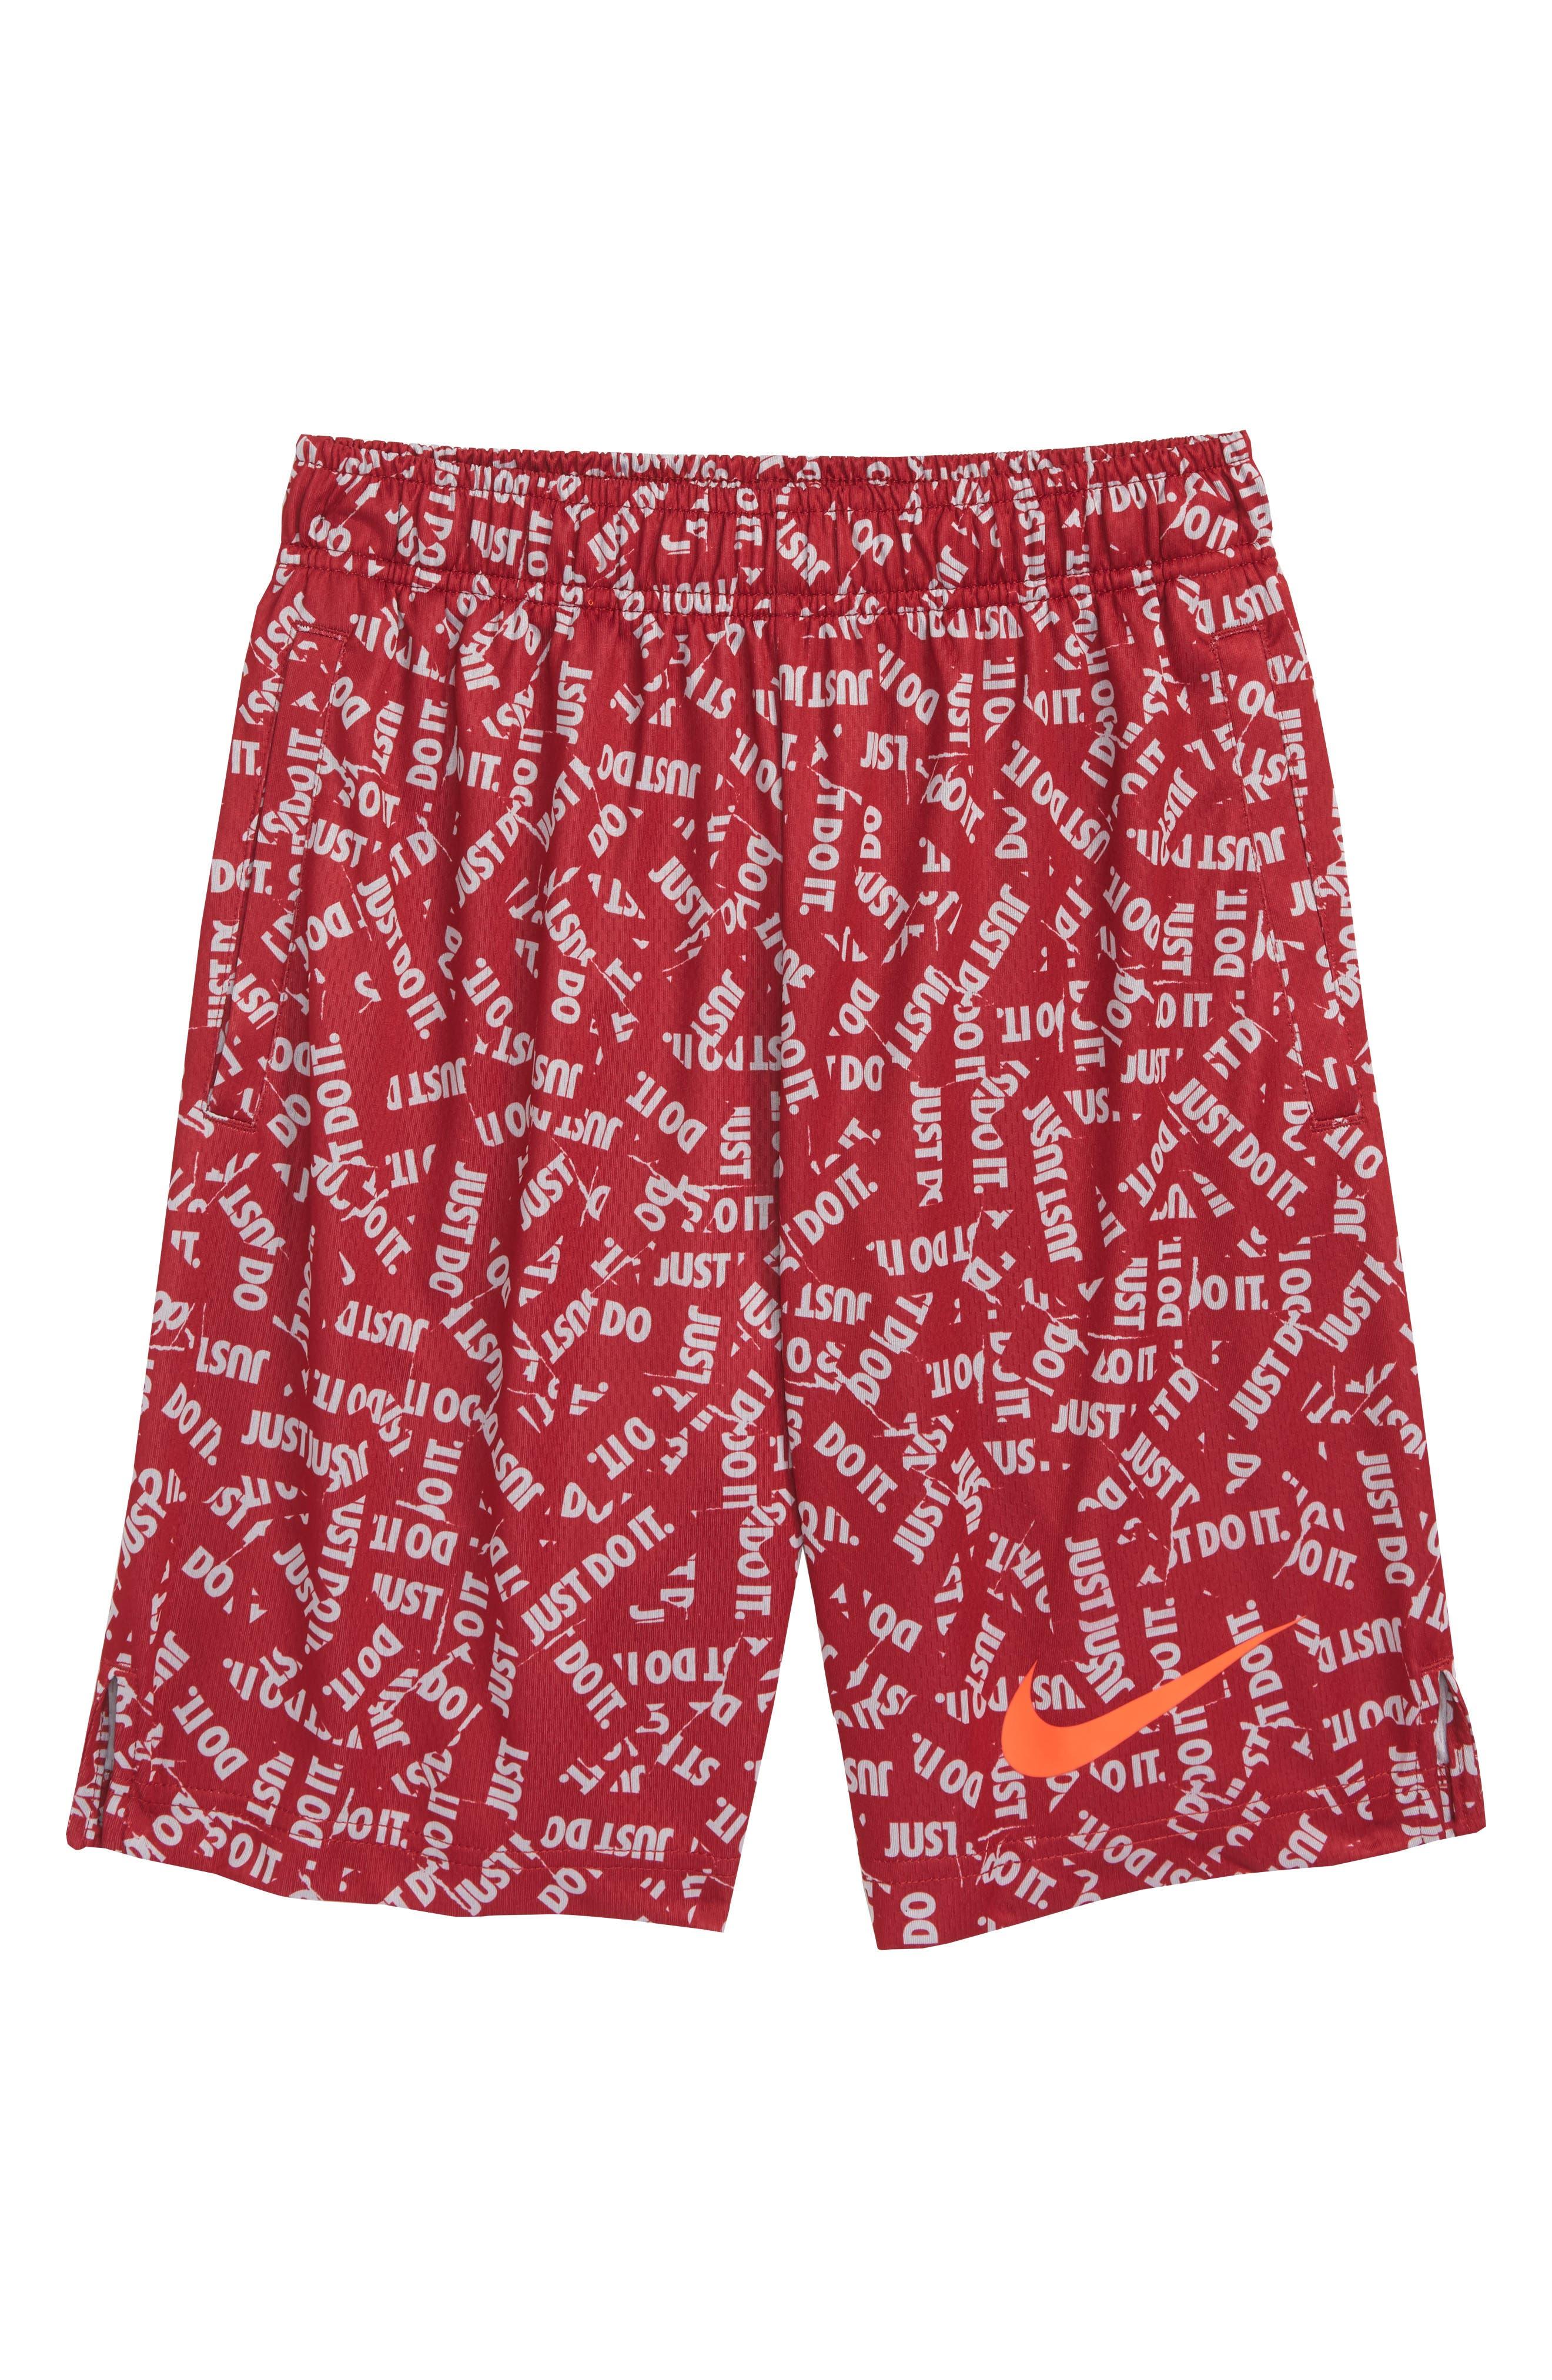 Dry Shorts,                             Main thumbnail 1, color,                             RED CRUSH/ BRIGHT CRIMSON